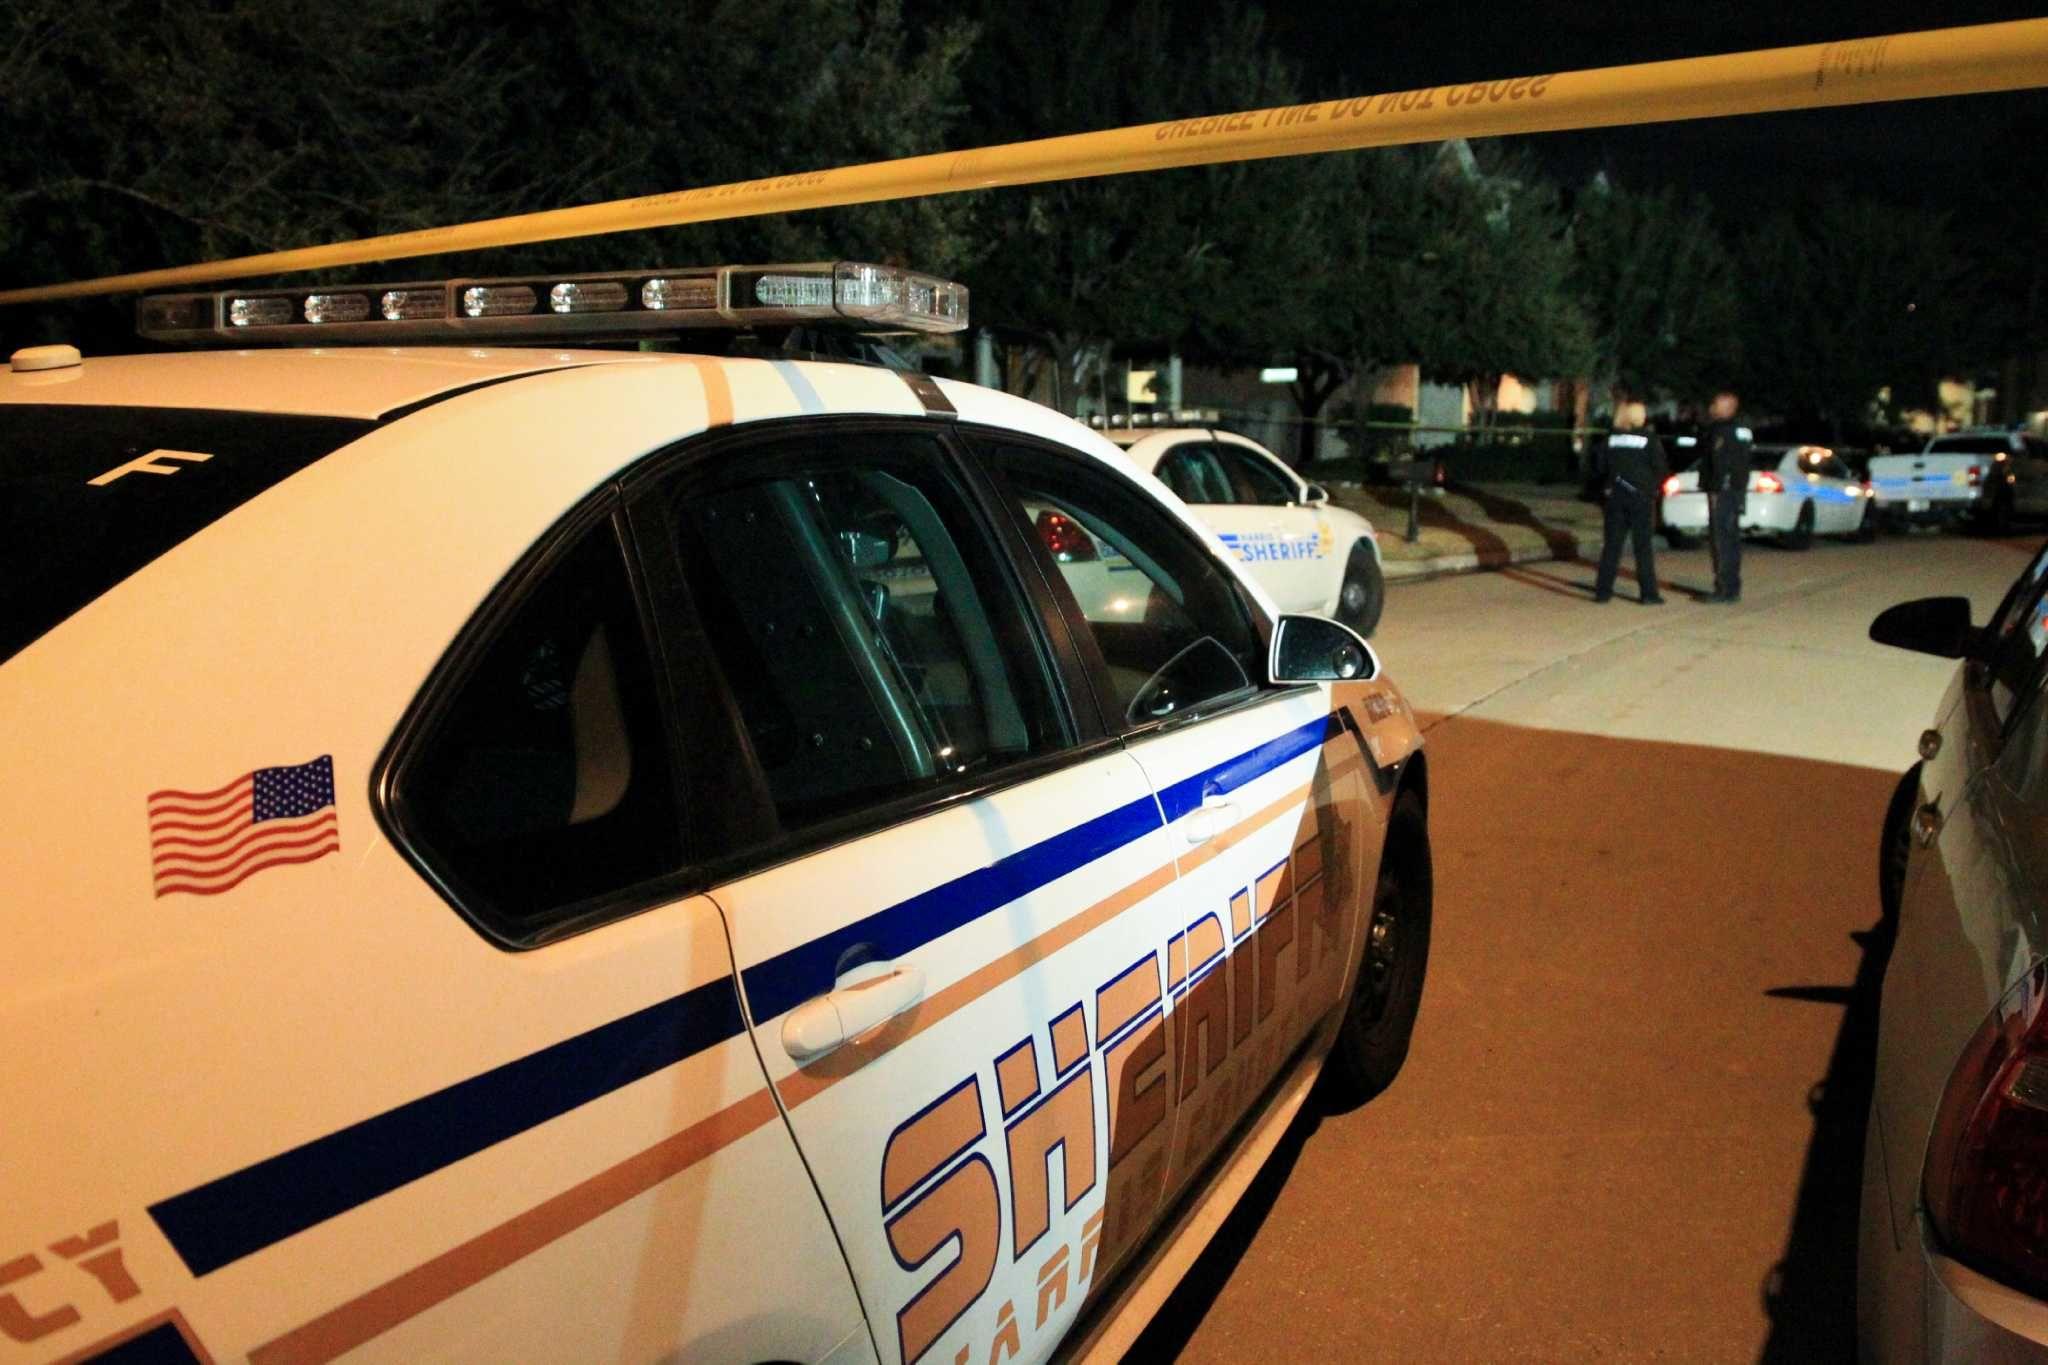 Fit For Duty Thousands Of Law Enforcement Officers Weren T Properly Certified Law Enforcement Law Enforcement Officer Law Enforcement Agencies